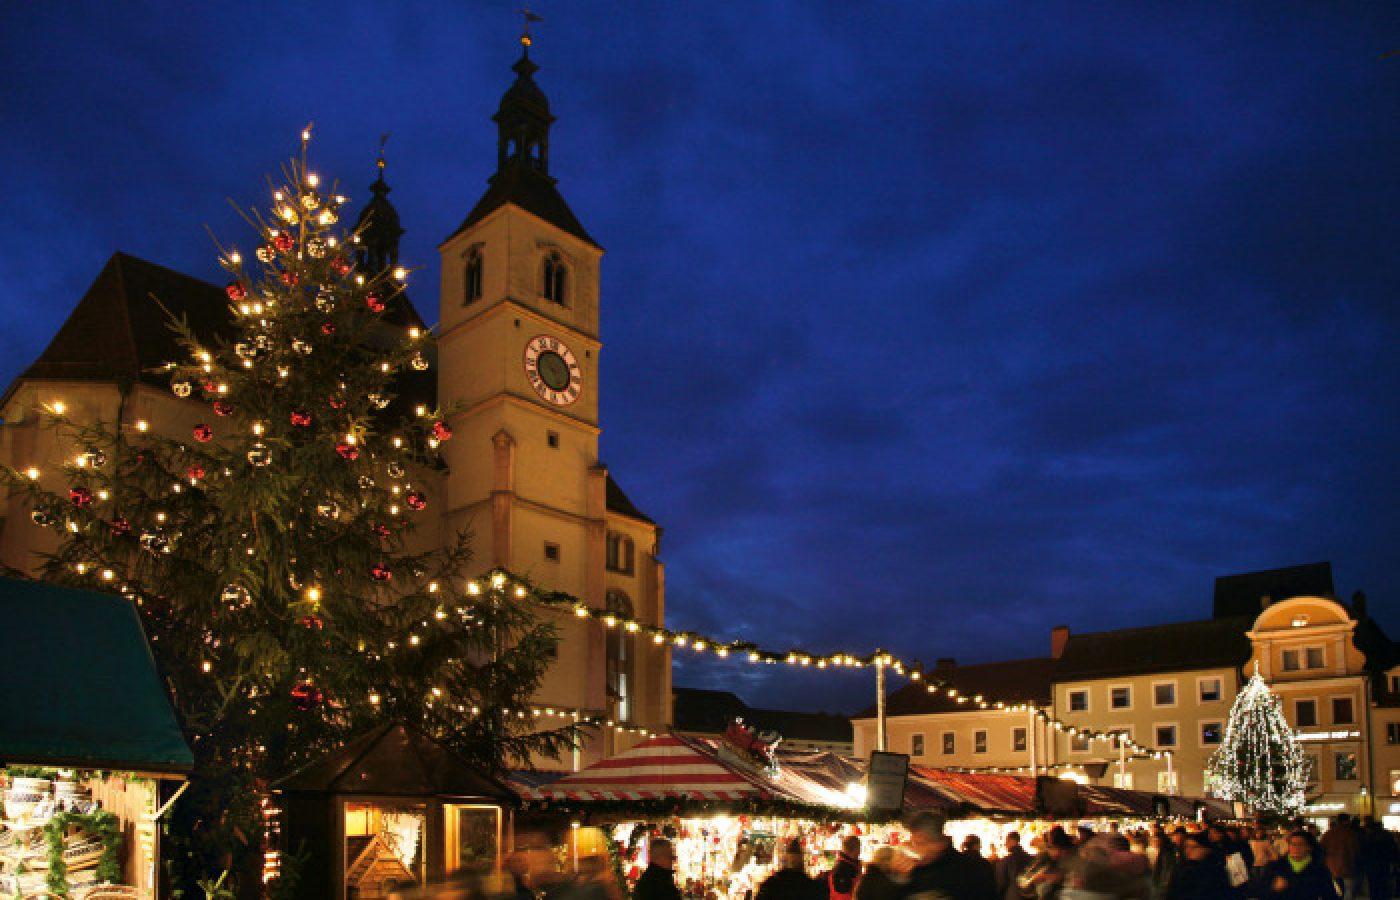 hotel_bad_abbach_ausflugsziel_regensburg_christkindlmarkt